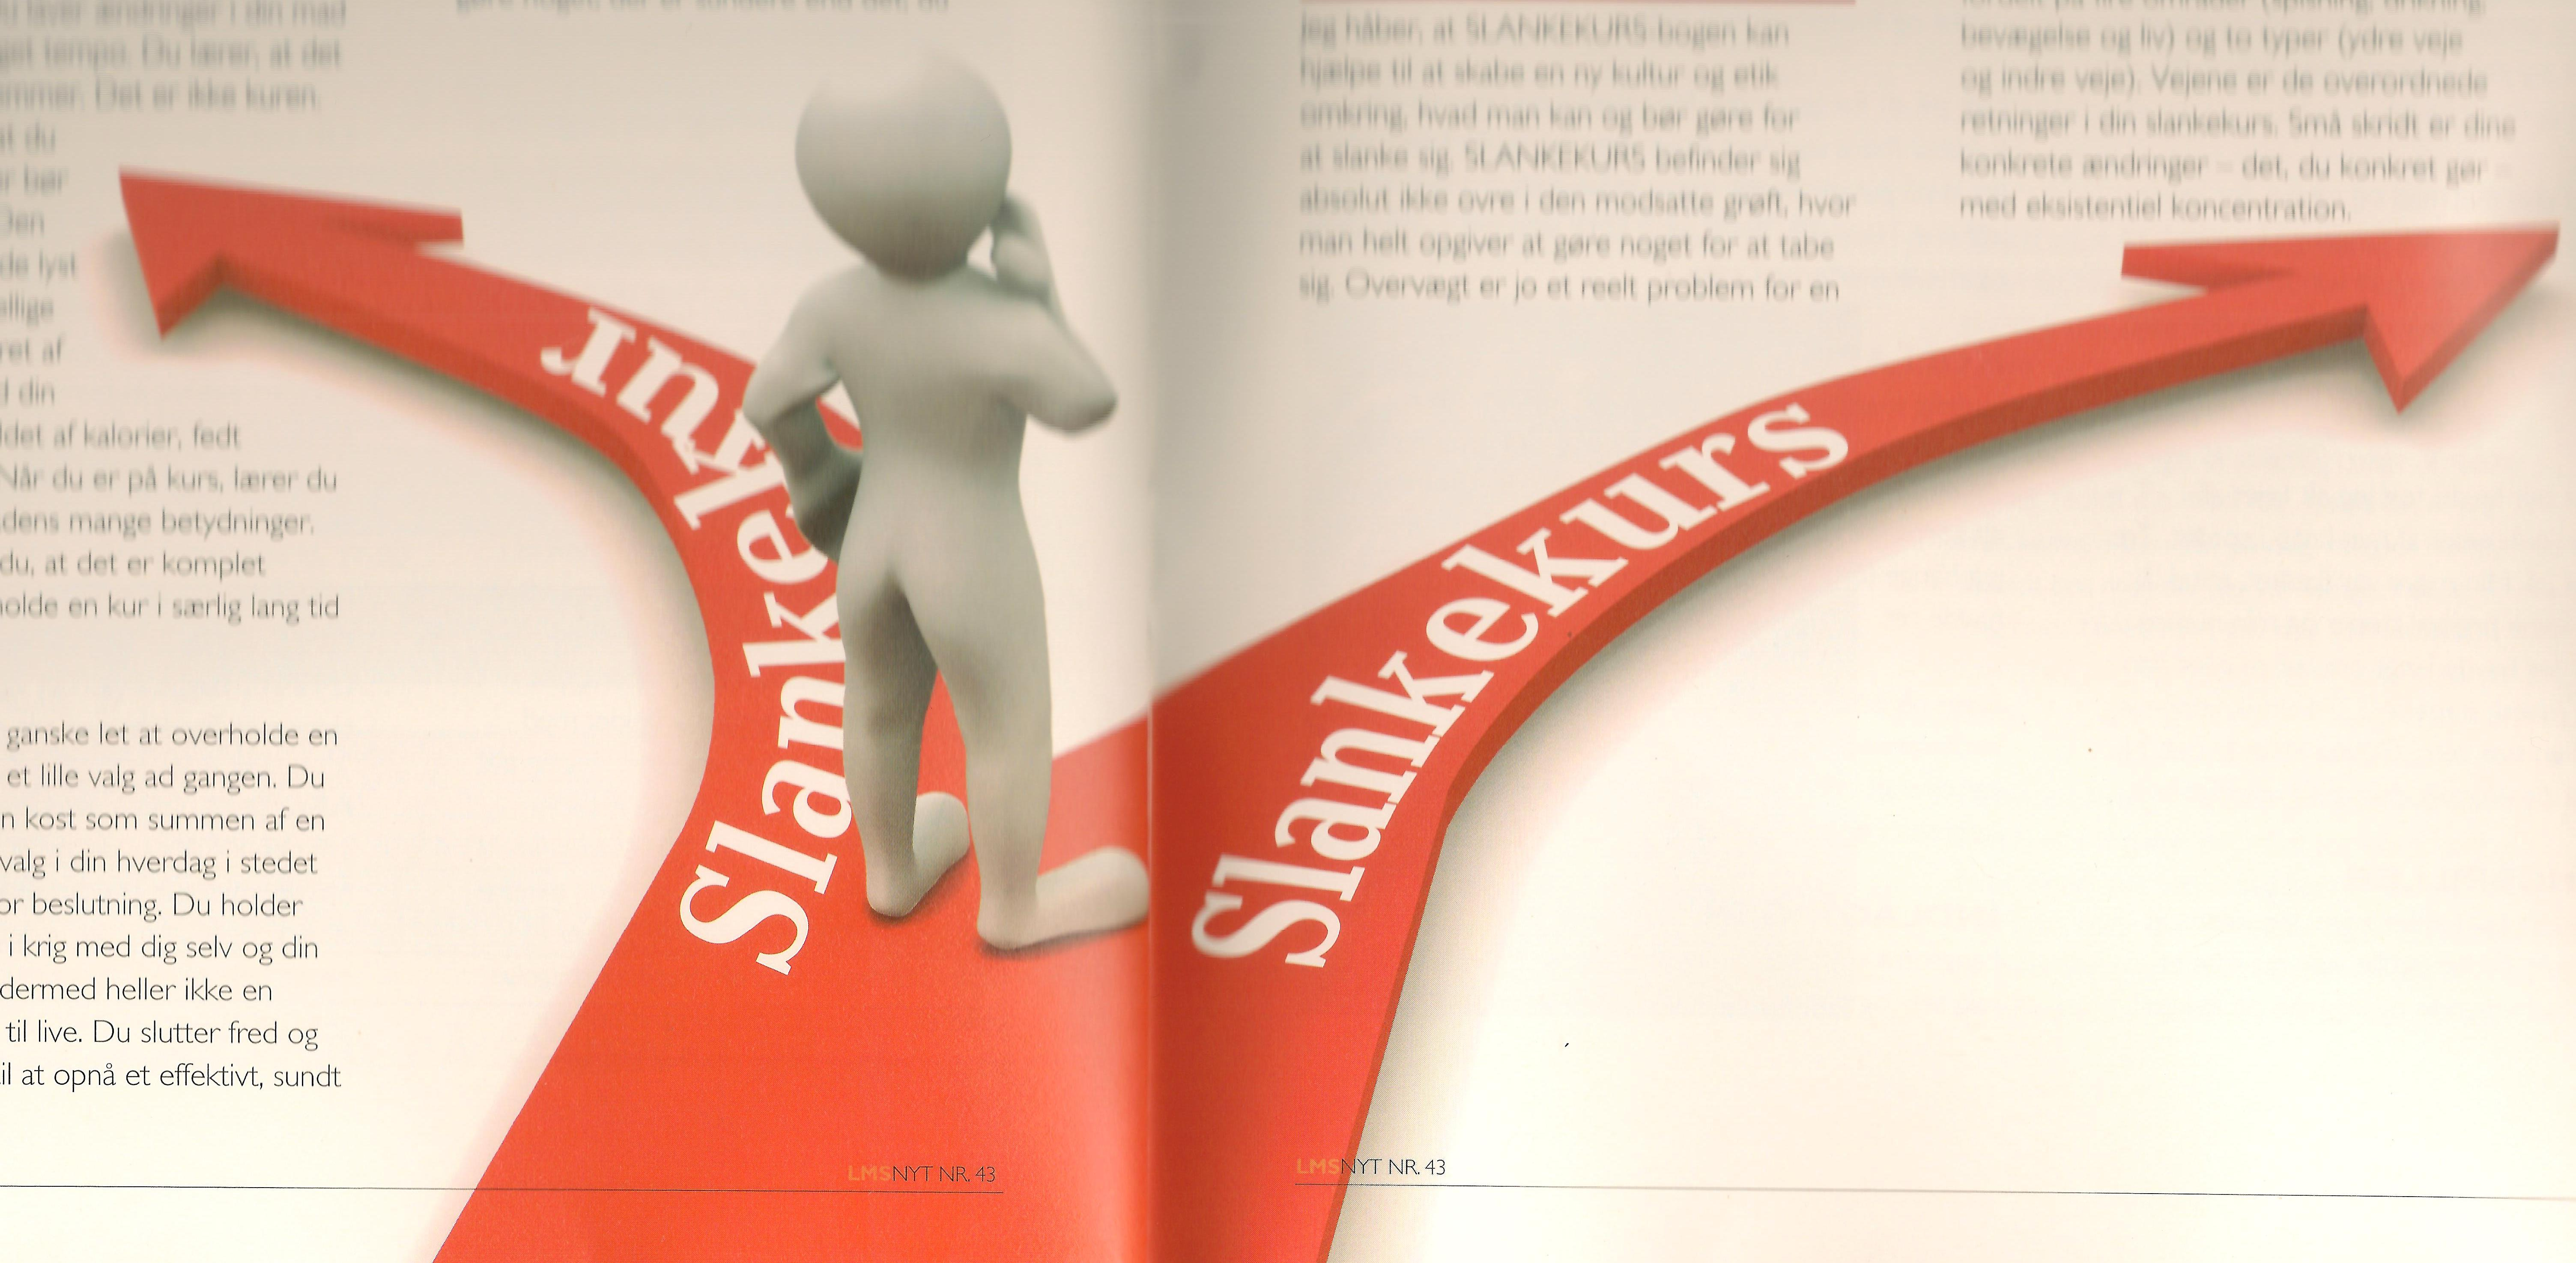 Slankekur vs slankekurs LMS